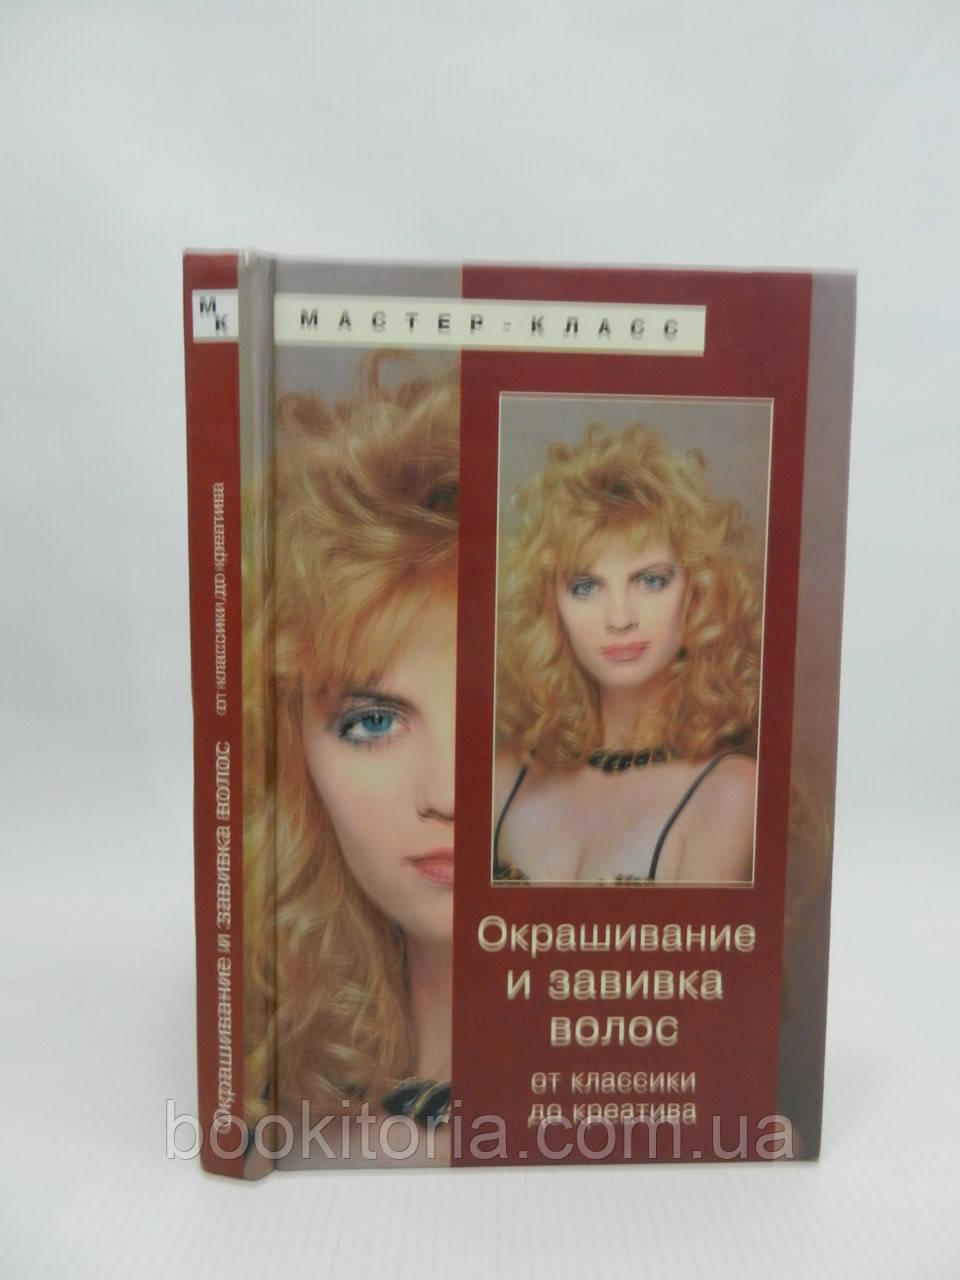 Окрашивание и завивка волос: от классики до креатива (б/у)., фото 1